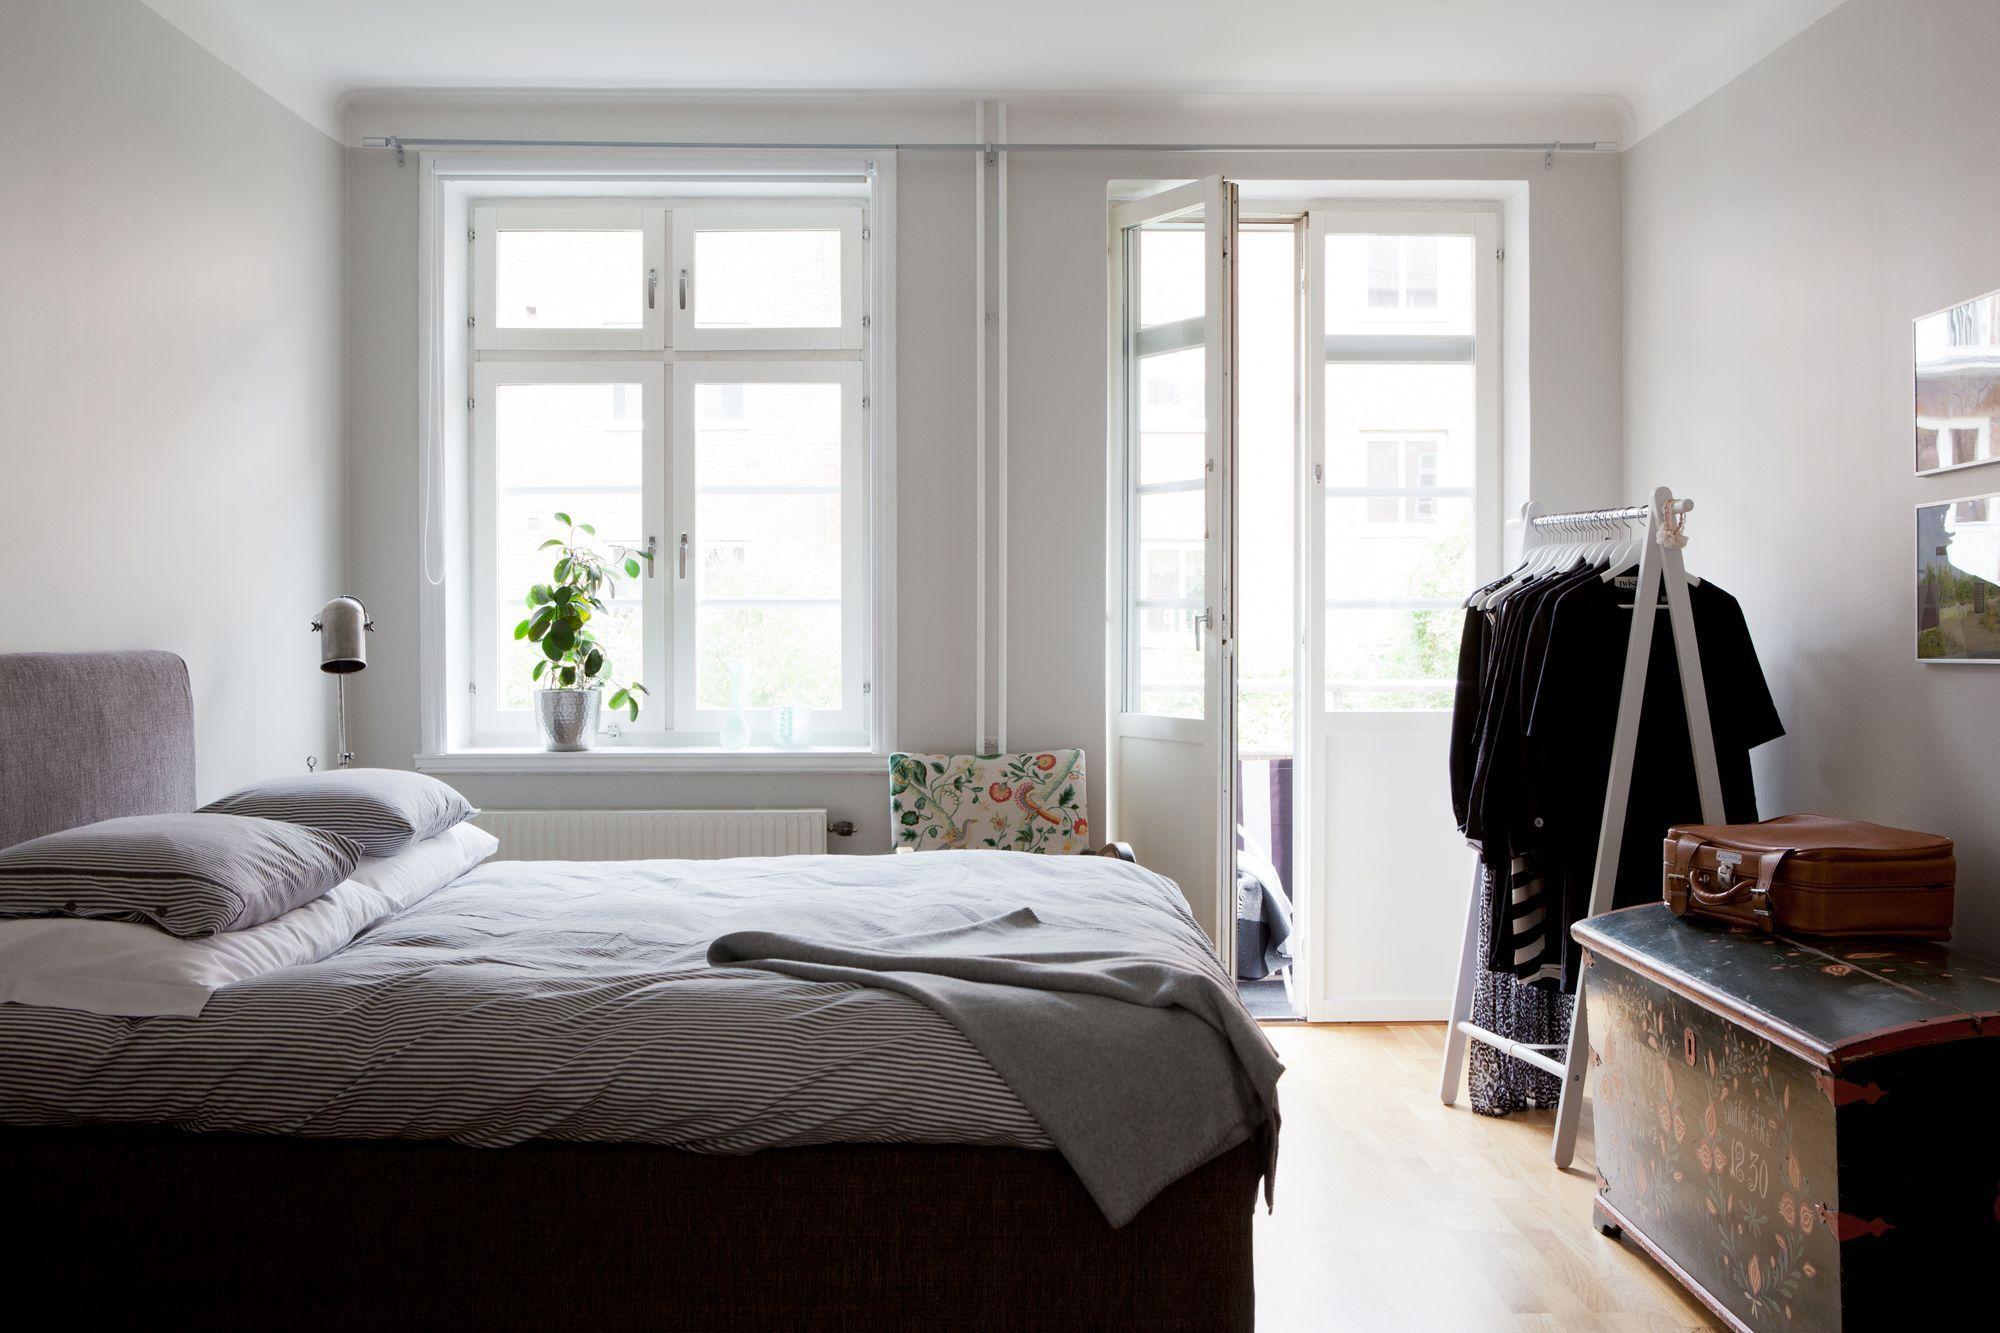 Paredes Grises Muebles Blancos Suelo De Madera Paredes Grises  # Muebles Habitacion Ikea